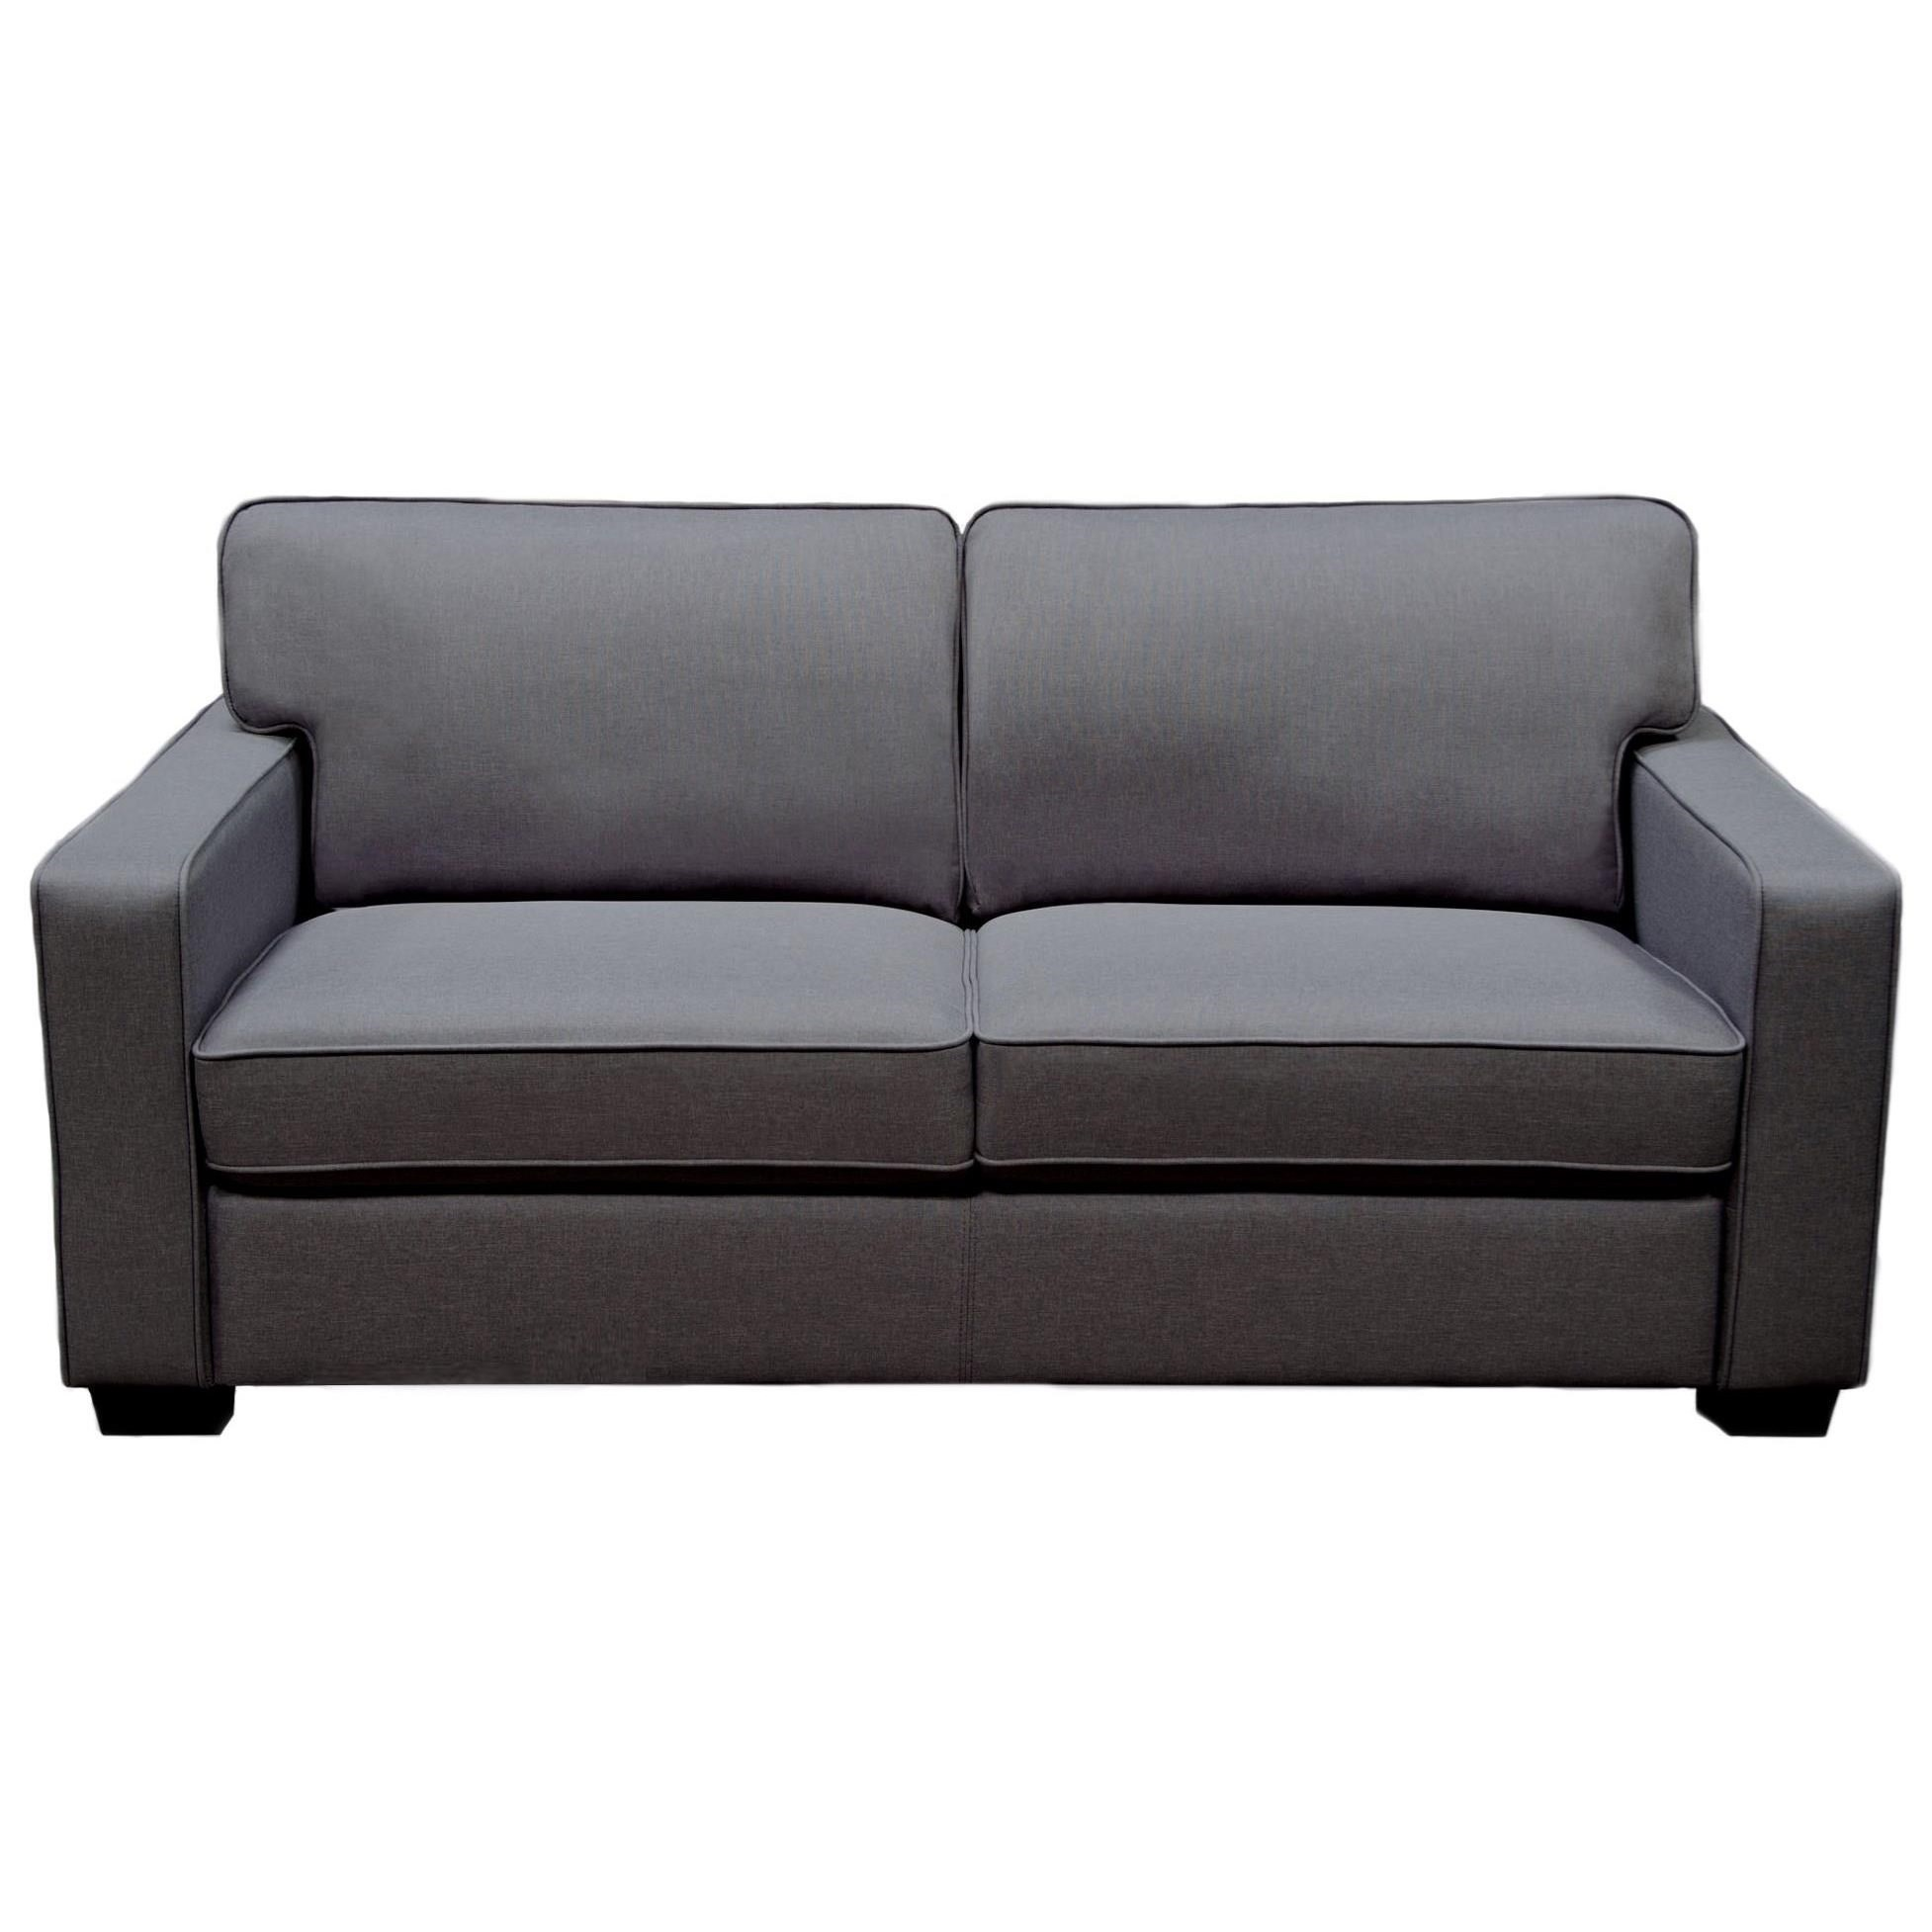 watson sofa table saver cat scratcher diamond red knot sofas